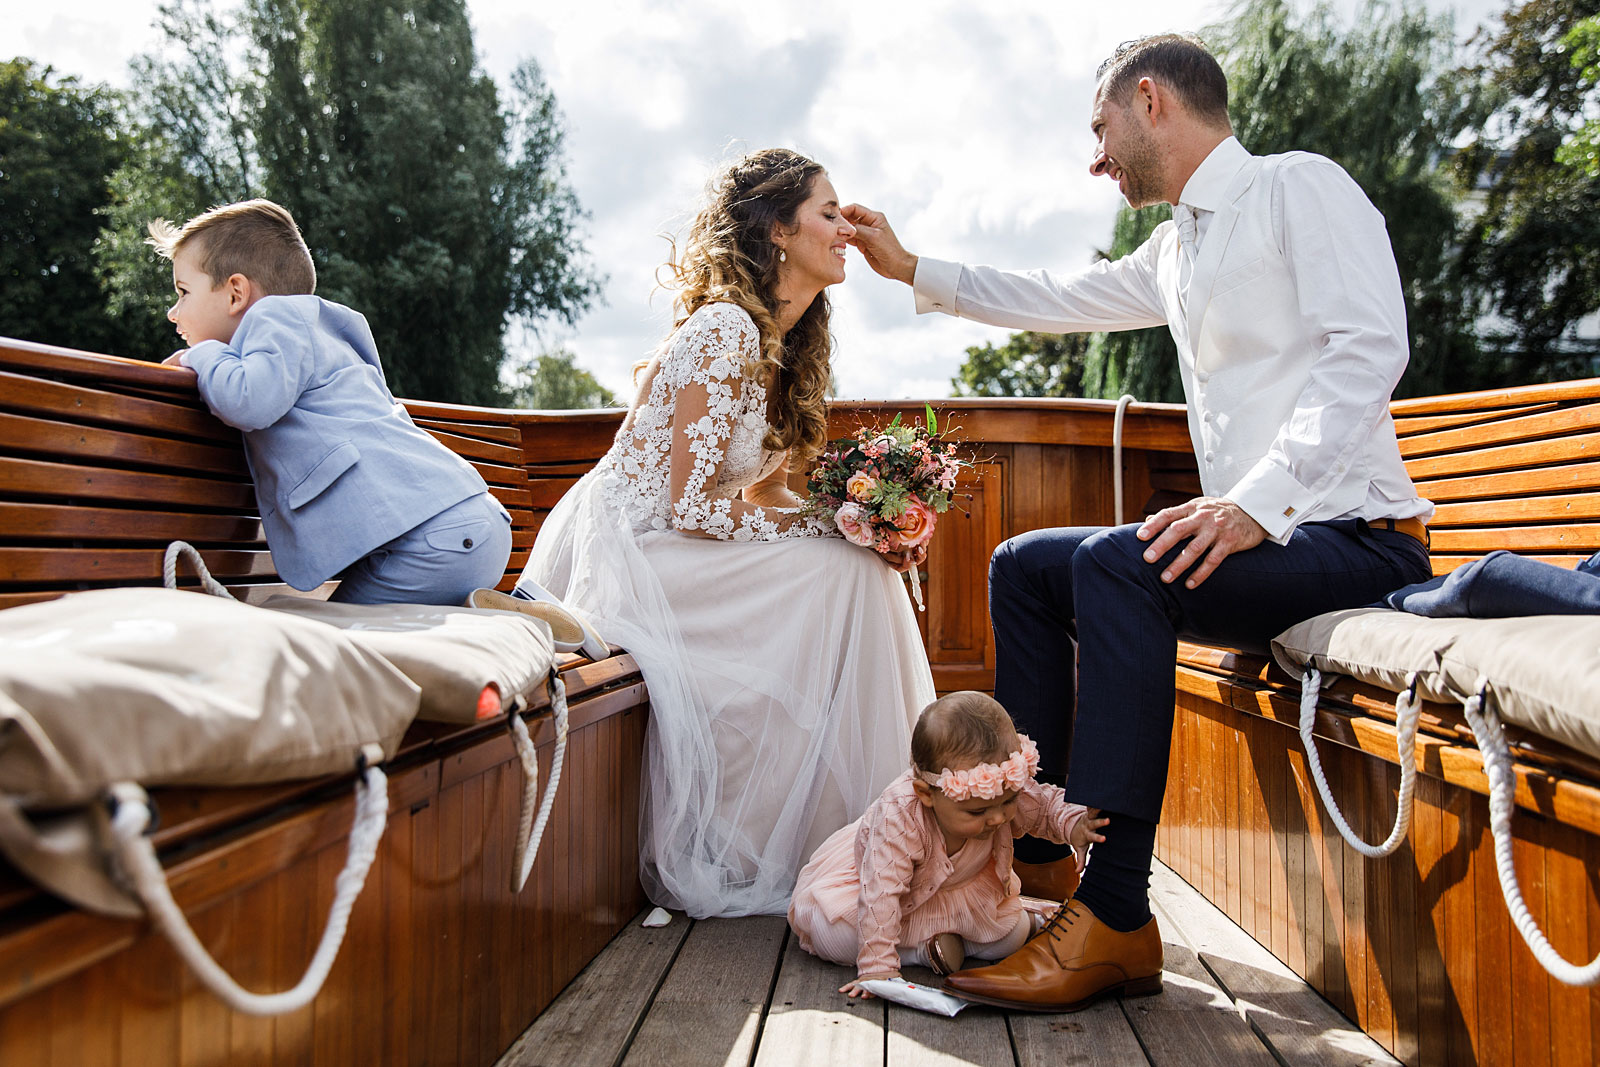 06-fotoshoot-bruiloft-leiden-grachten